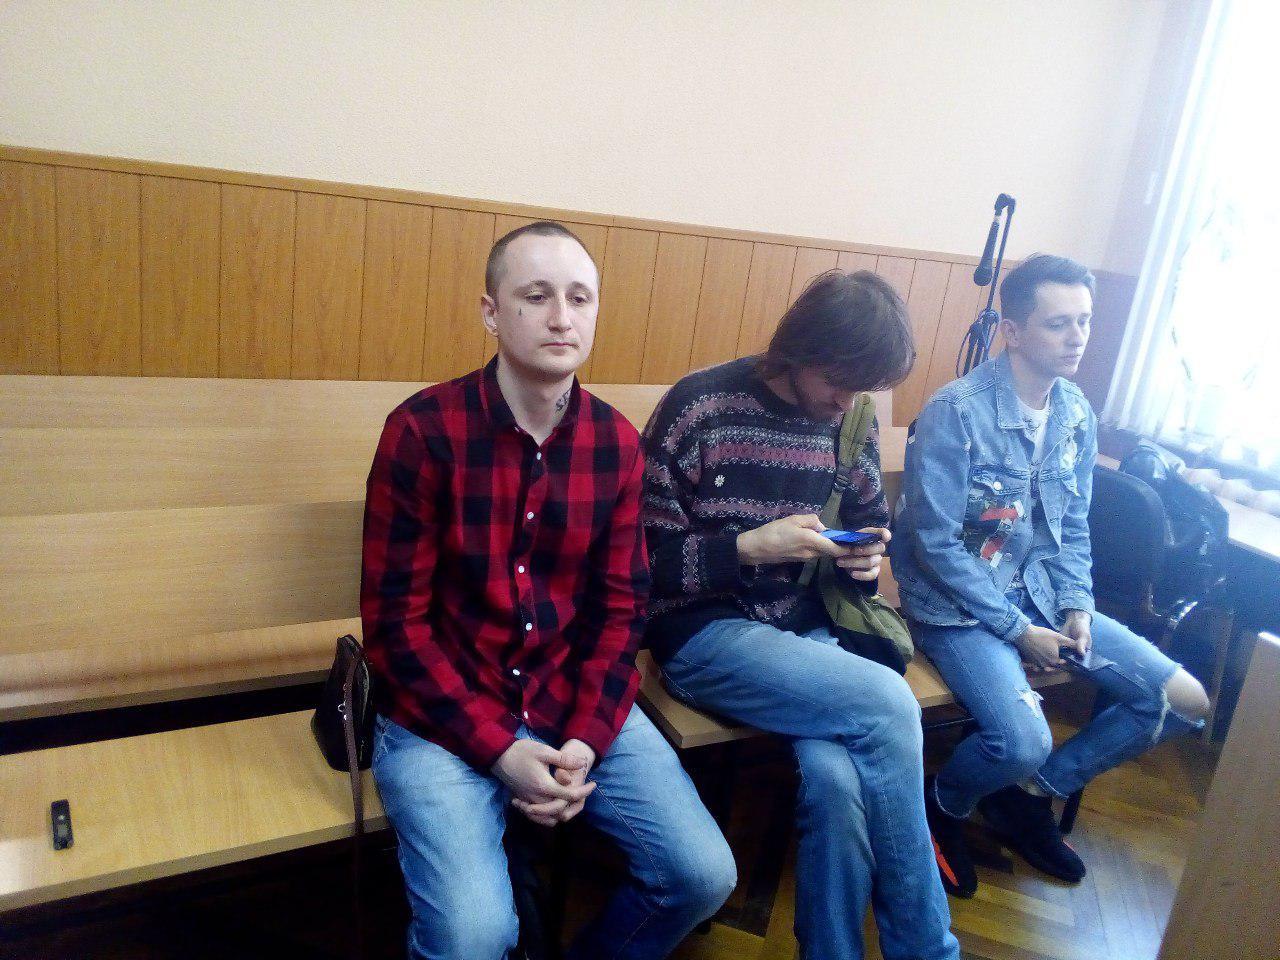 фото ЗакС политика Михаила Цакунова освободили от уголовного наказания